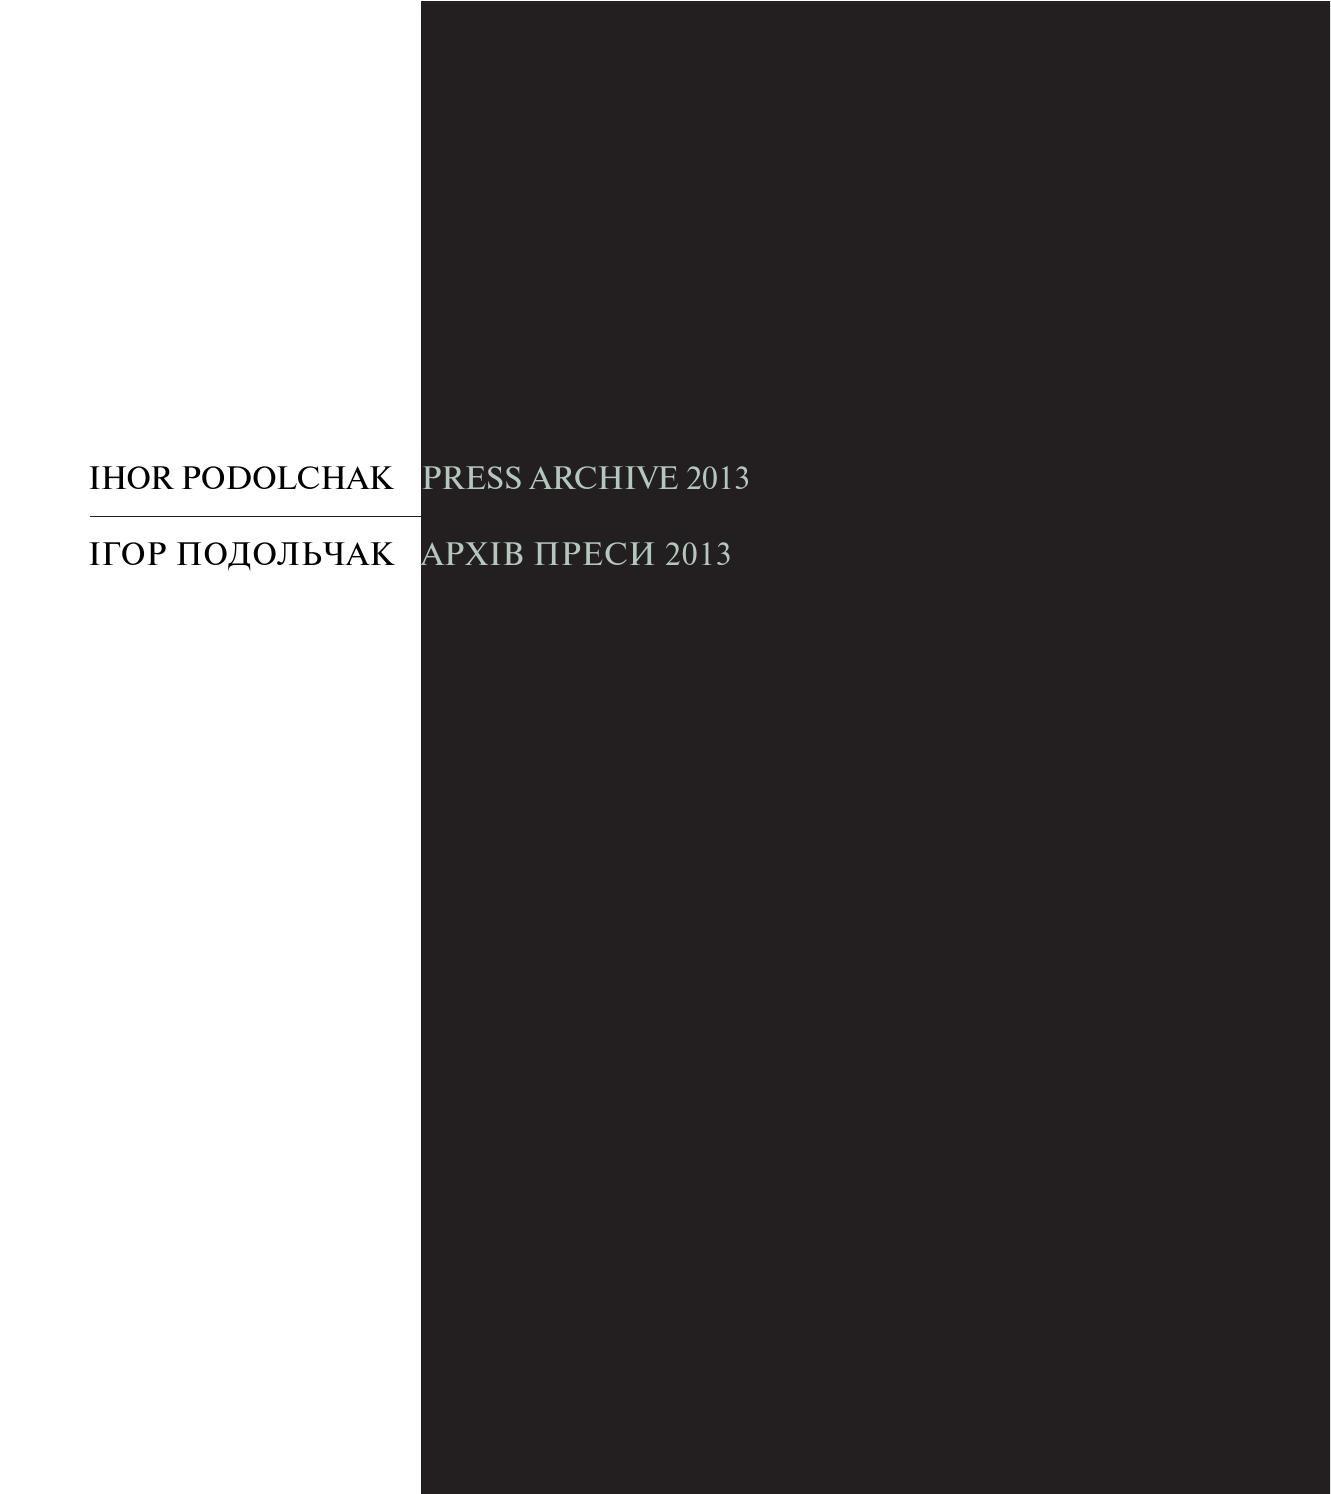 Lit Bébé D Appoint Charmant Ihor Podolchak S Press Archive 2013 by Ihor Podolchak issuu